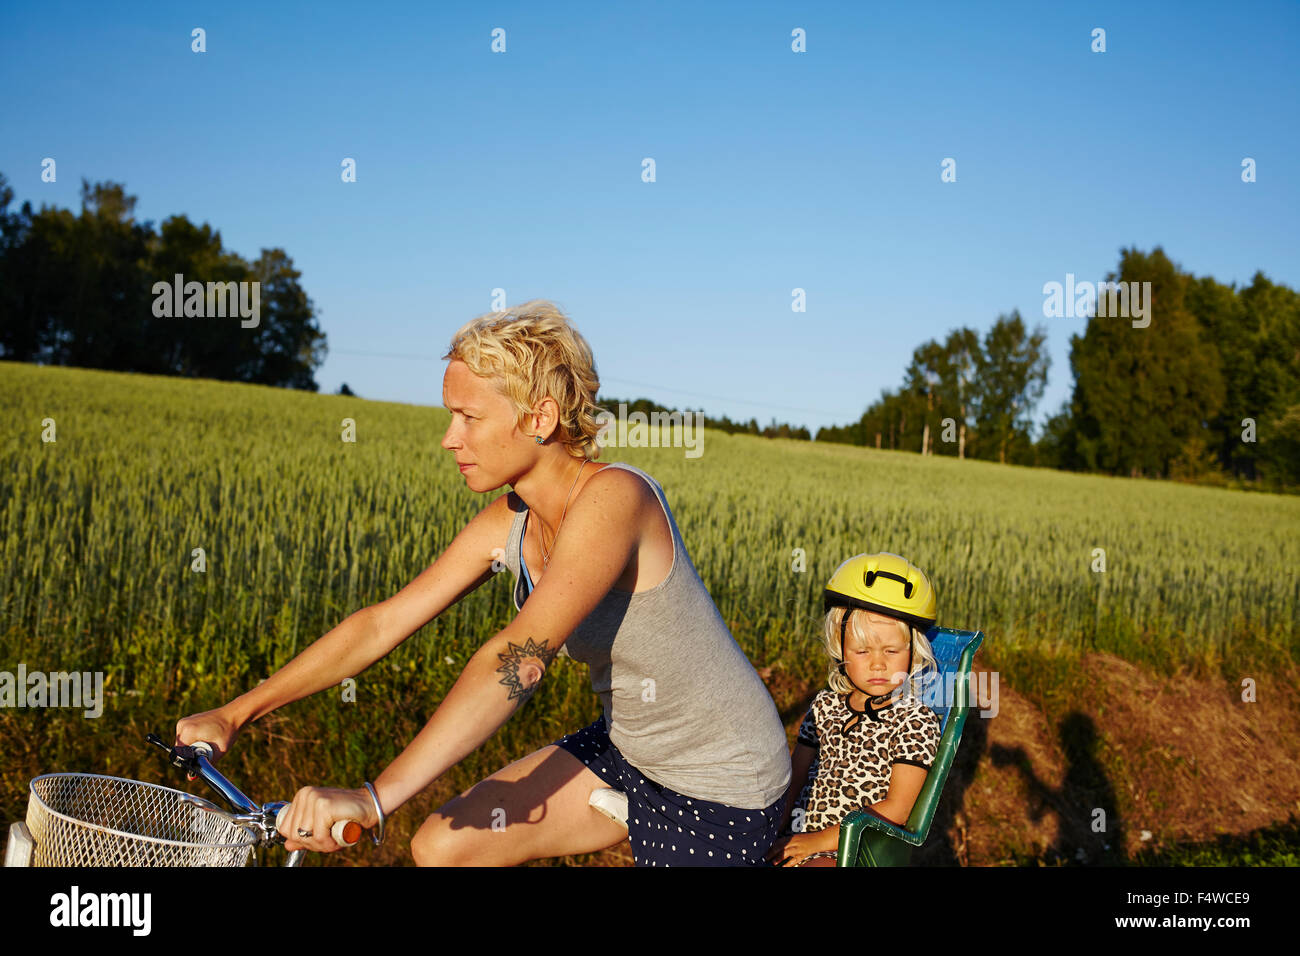 Frau mit Tochter (4-5) Reiten Fahrrad Stockbild